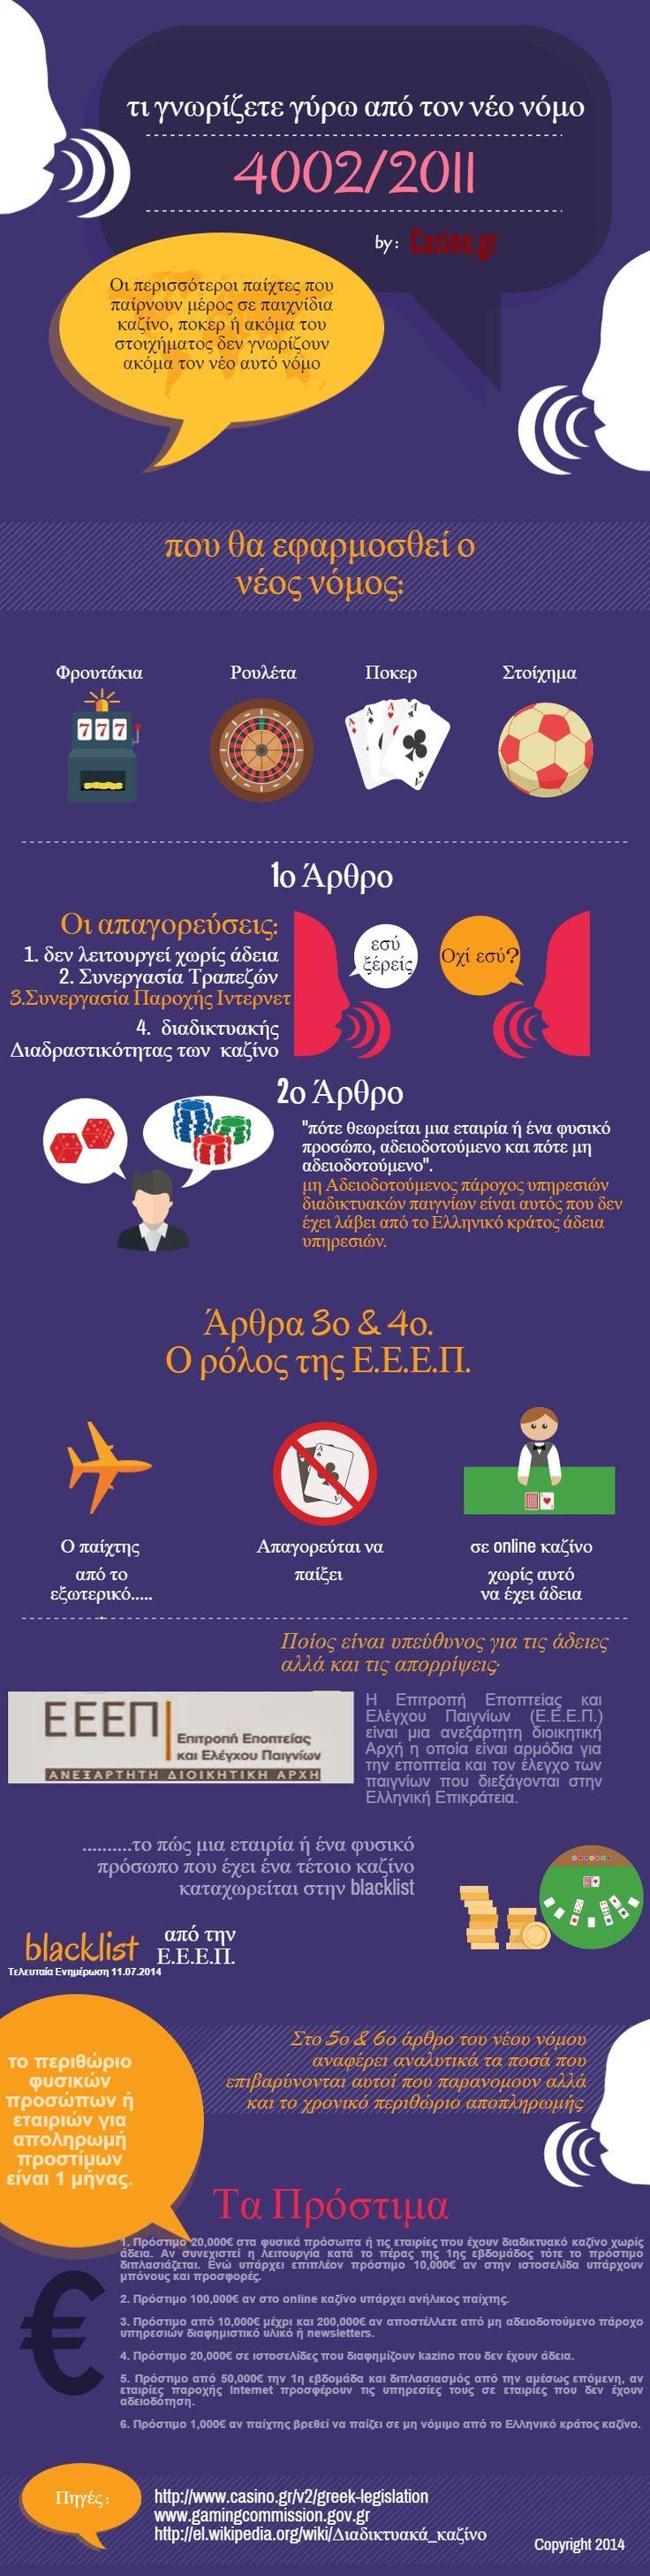 O νόμος 4002/2011 σε Infographic.